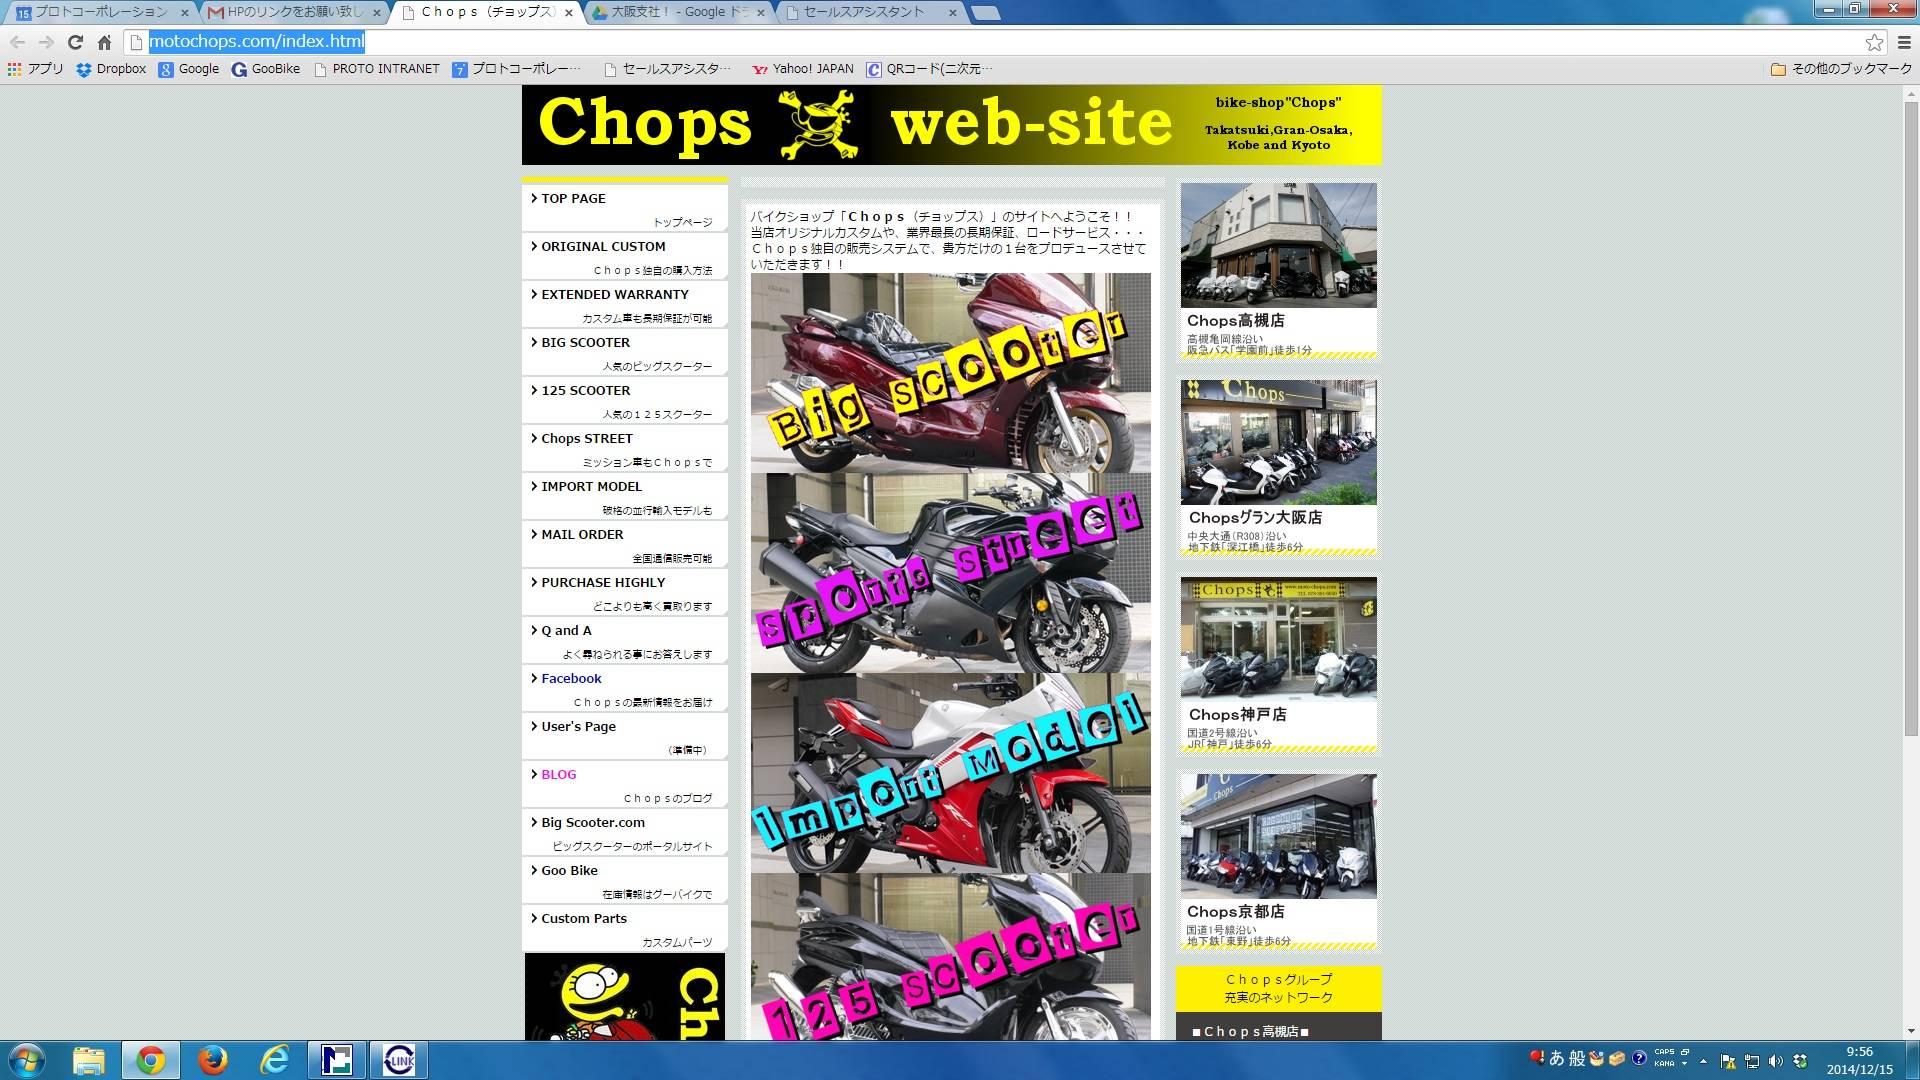 CHOPS� 京都店